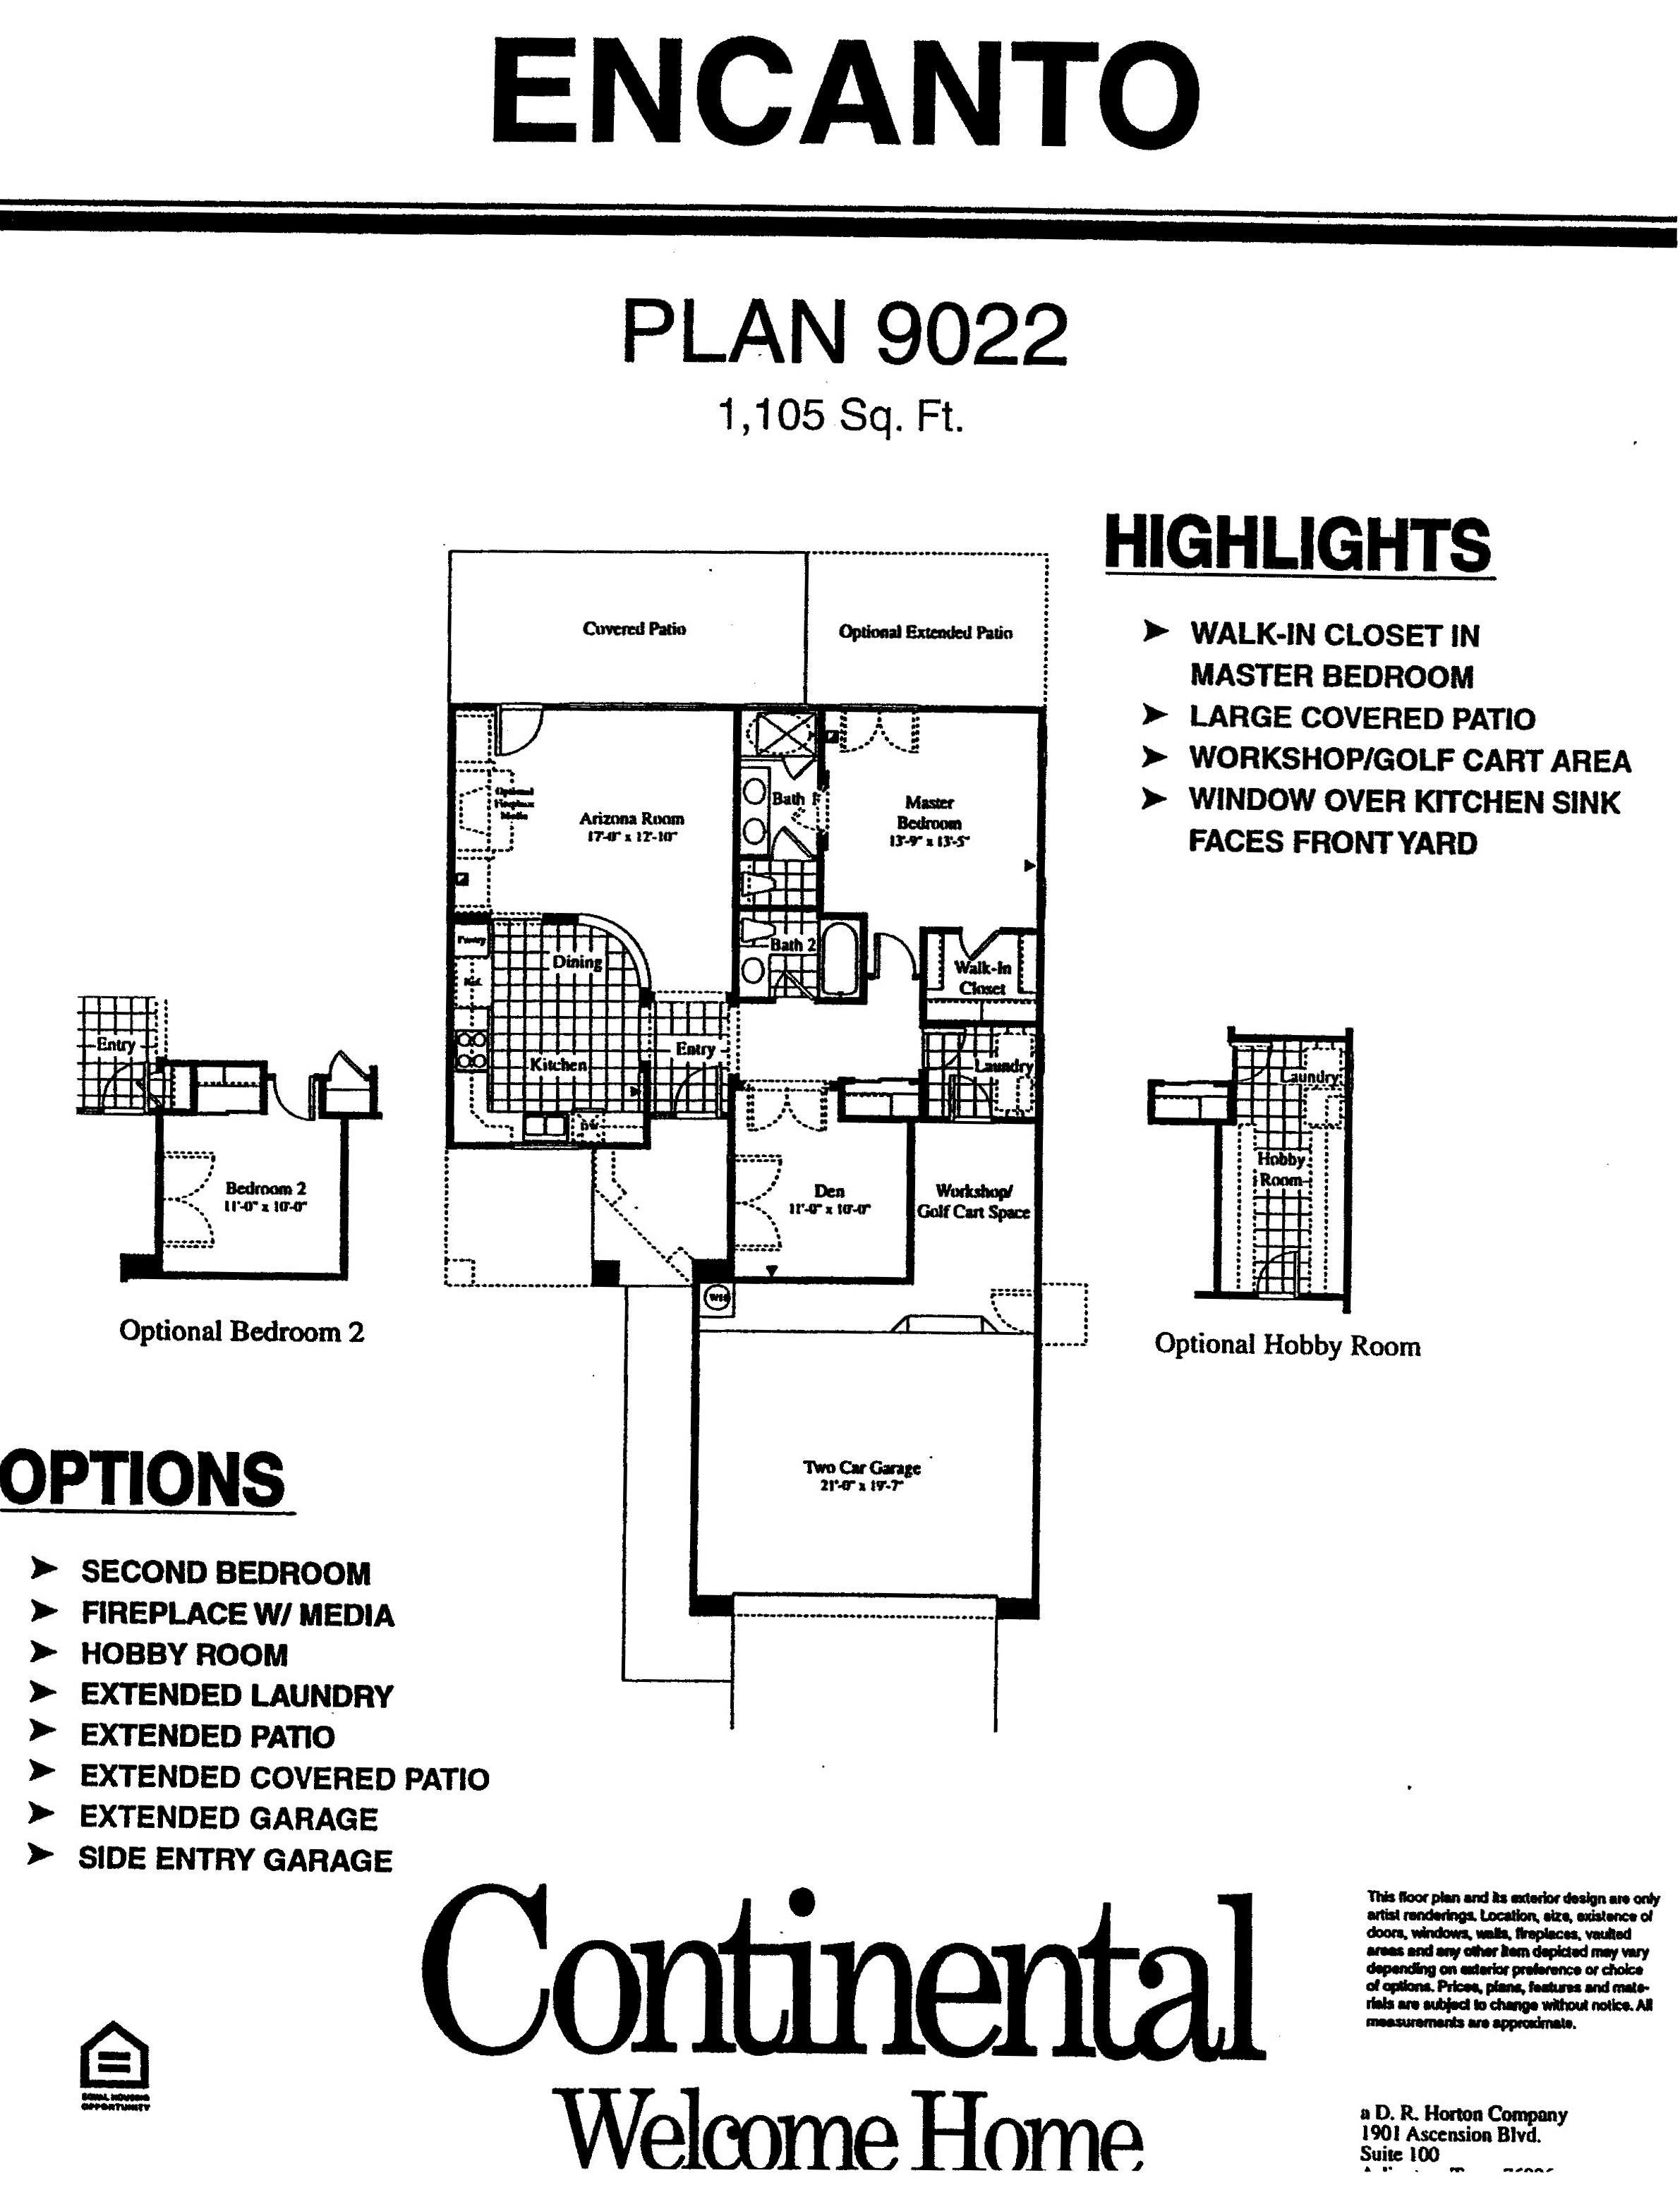 arizona traditions encanto floor plans plan model home homes floorplans surprise az arizona